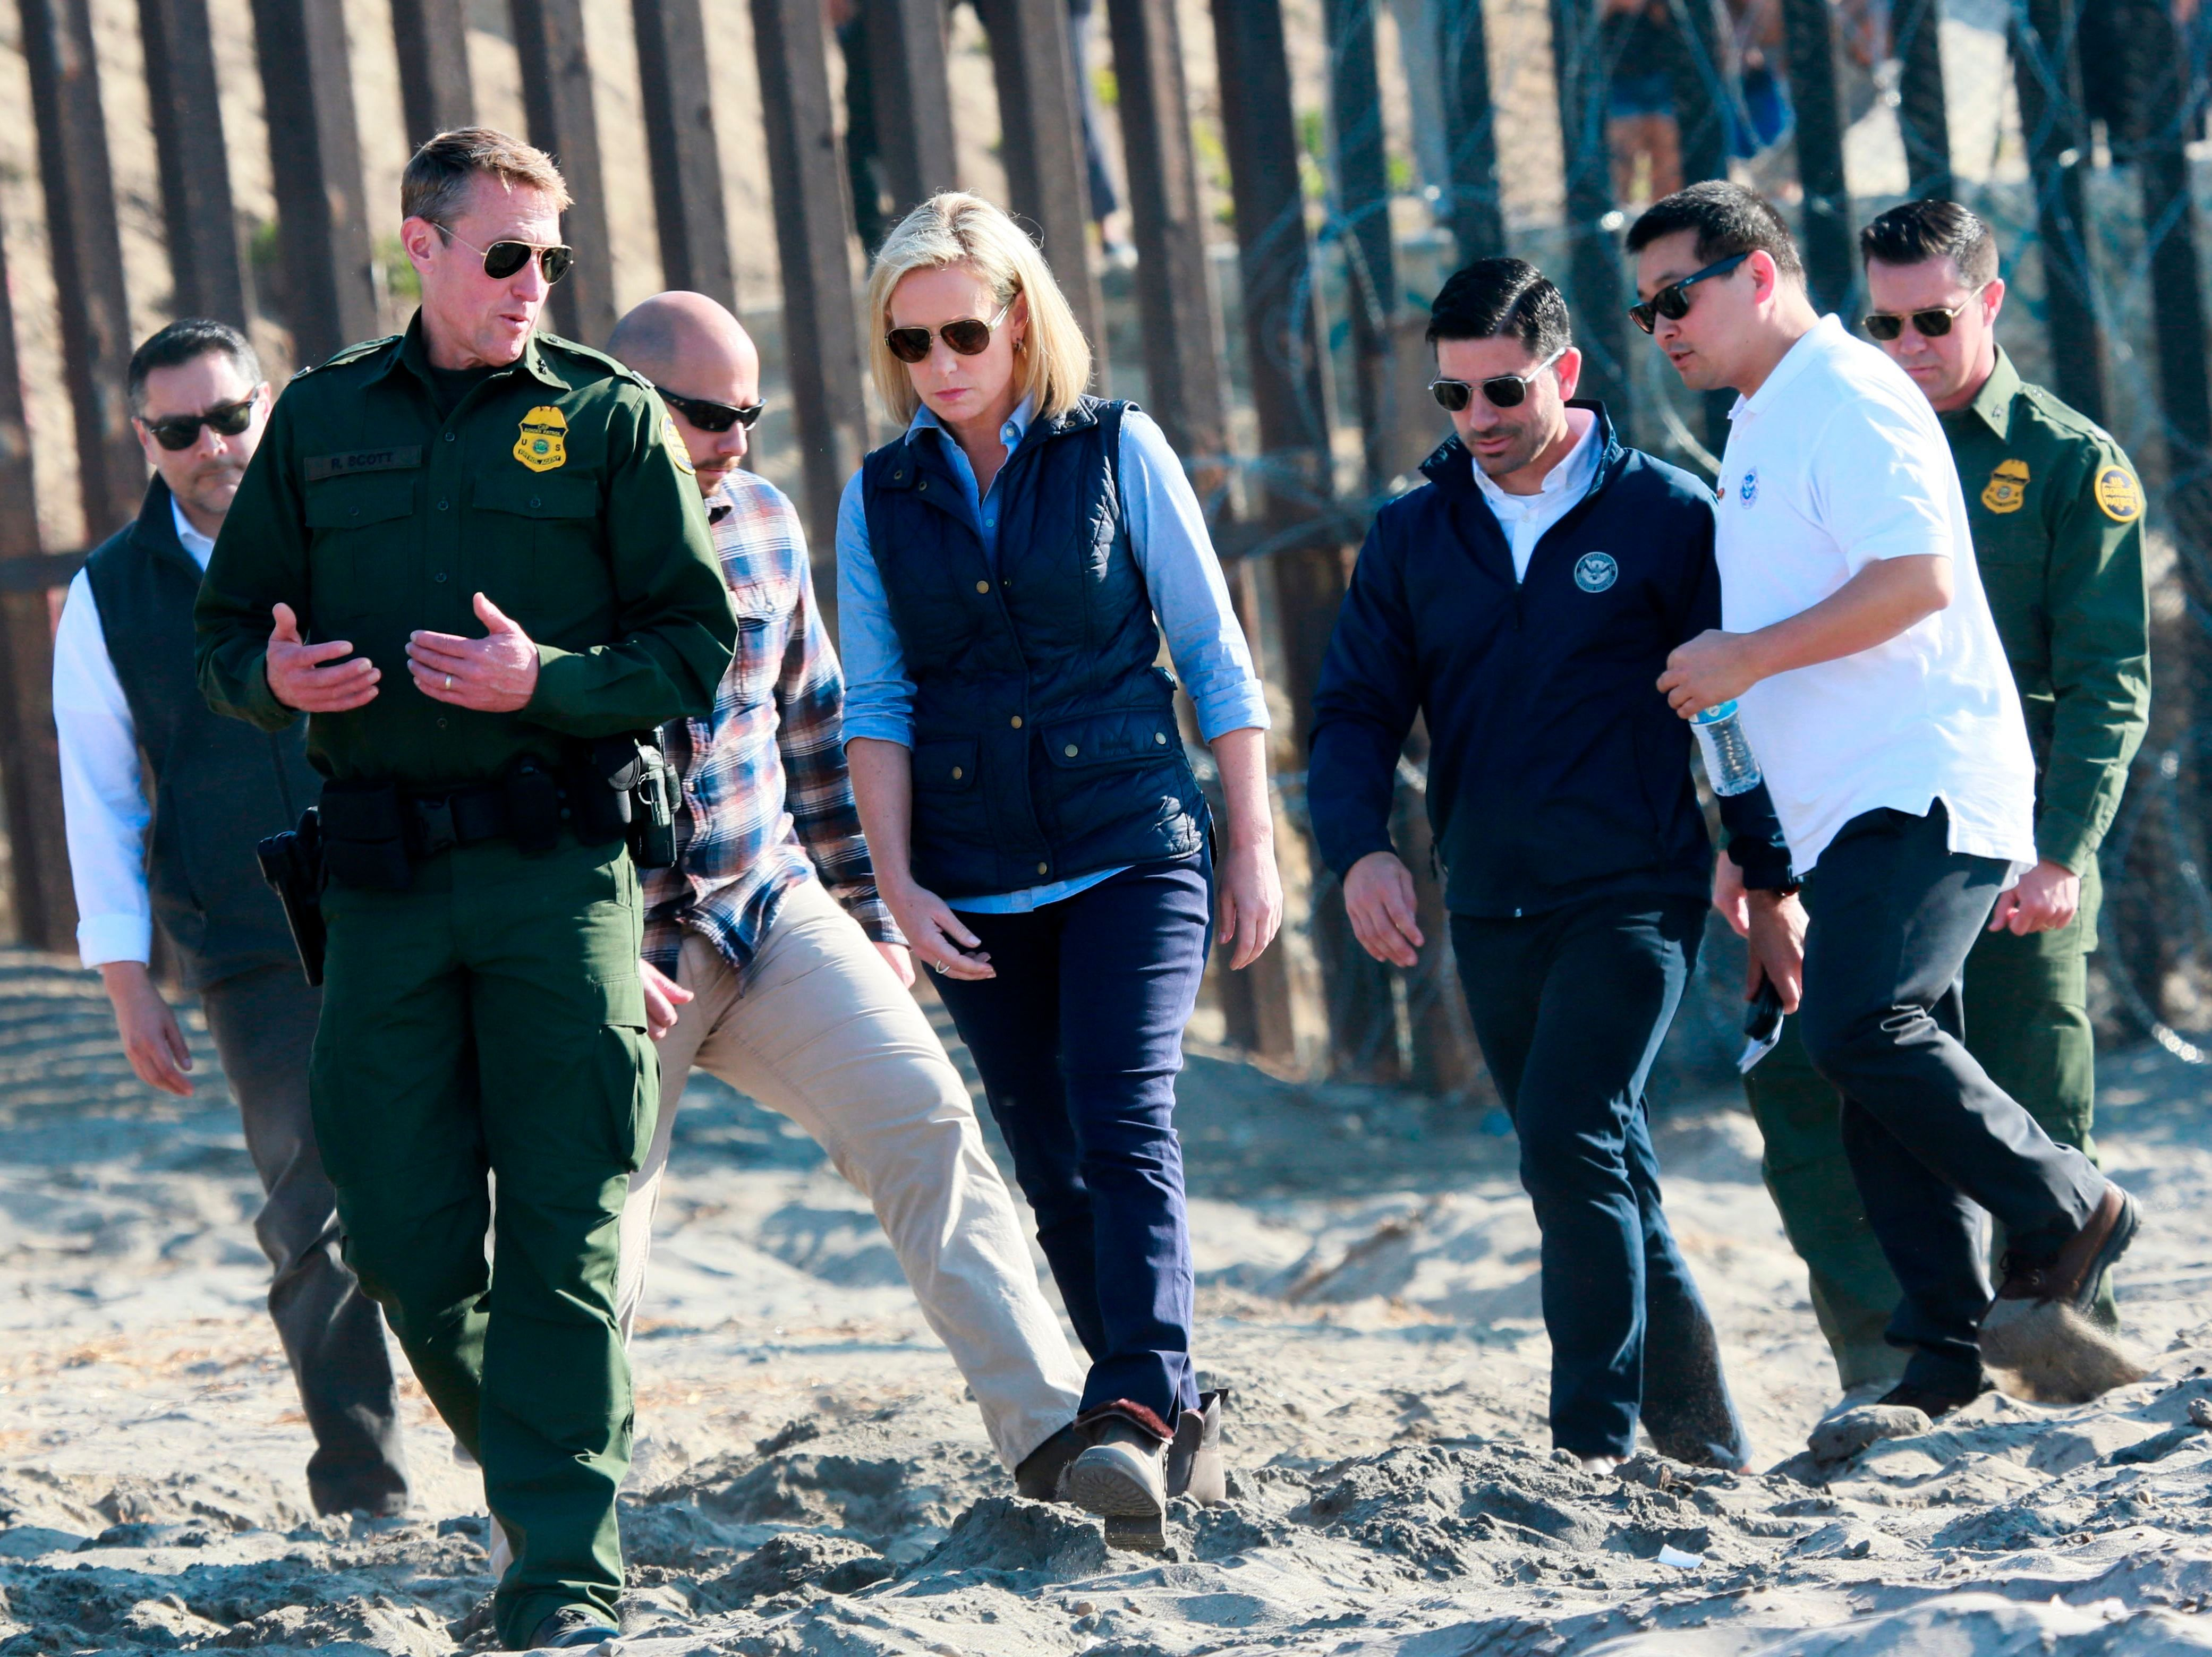 Homeland Security Secretary Kirstjen Nielsen tours the border area with San Diego Section Border Patrol Chief Rodney Scott, left, in San Ysidro, California, on Nov. 20.